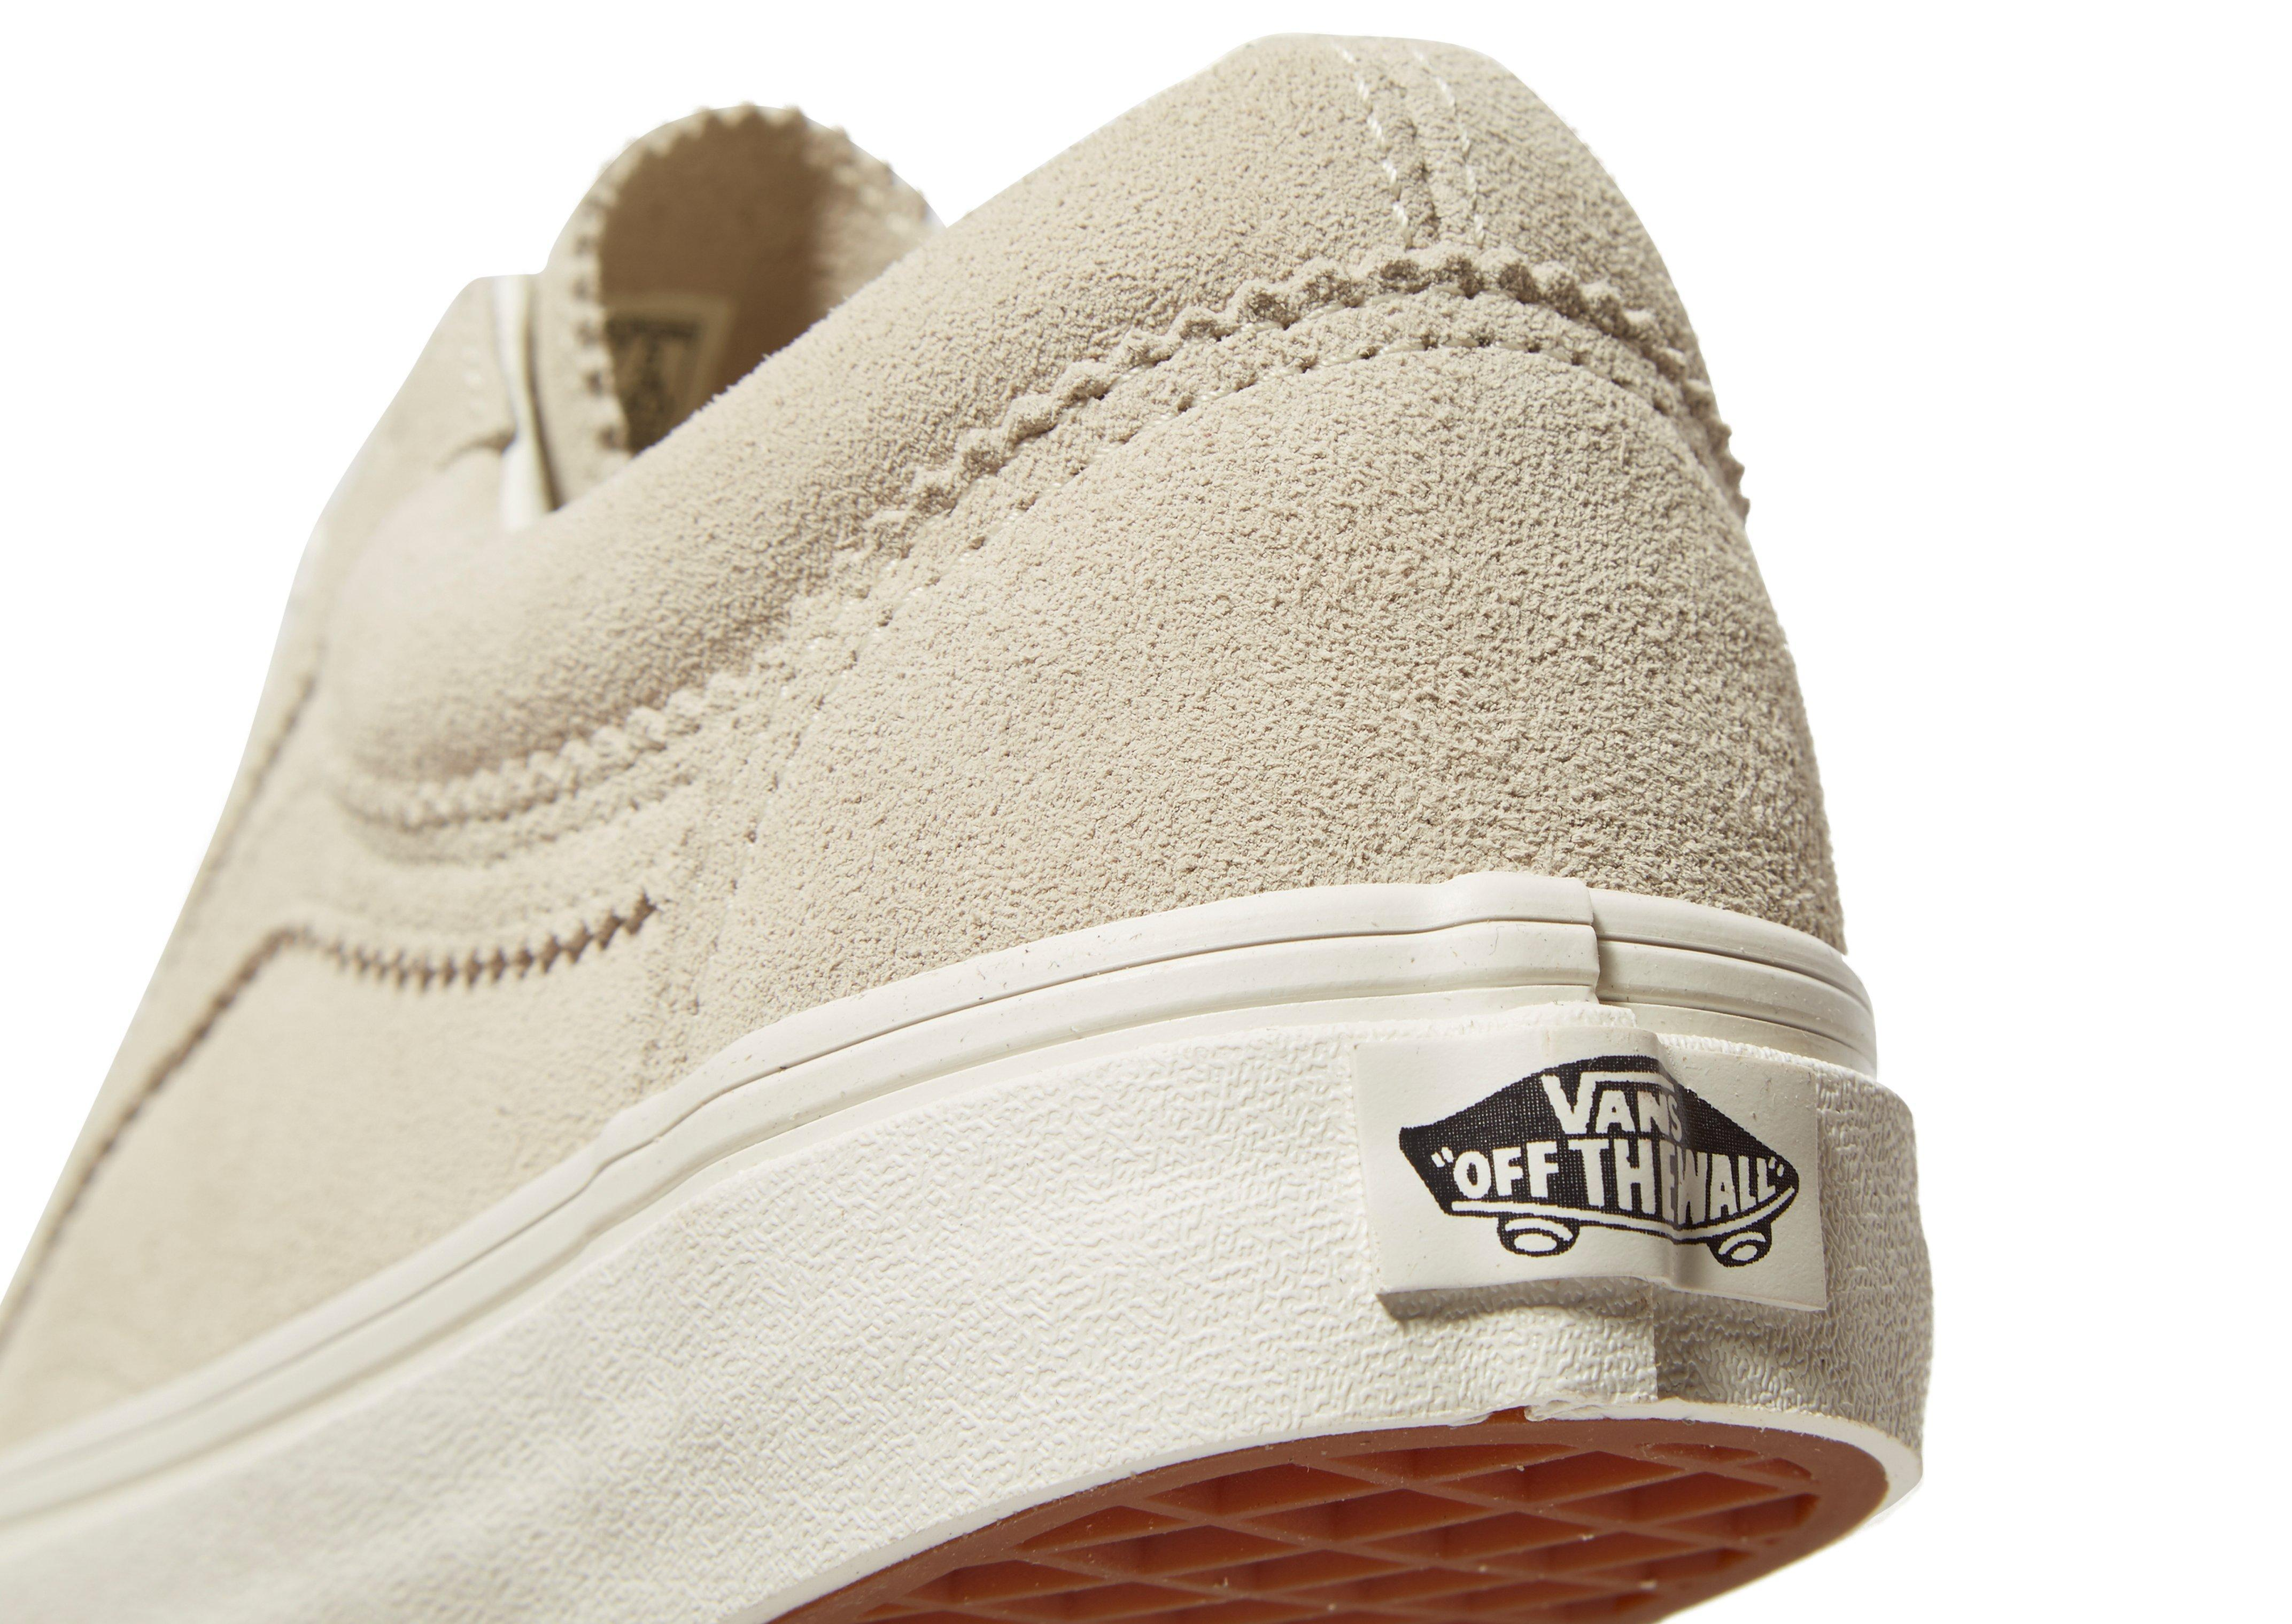 Vans Old Skool Suede in Cream (Natural) for Men - Lyst